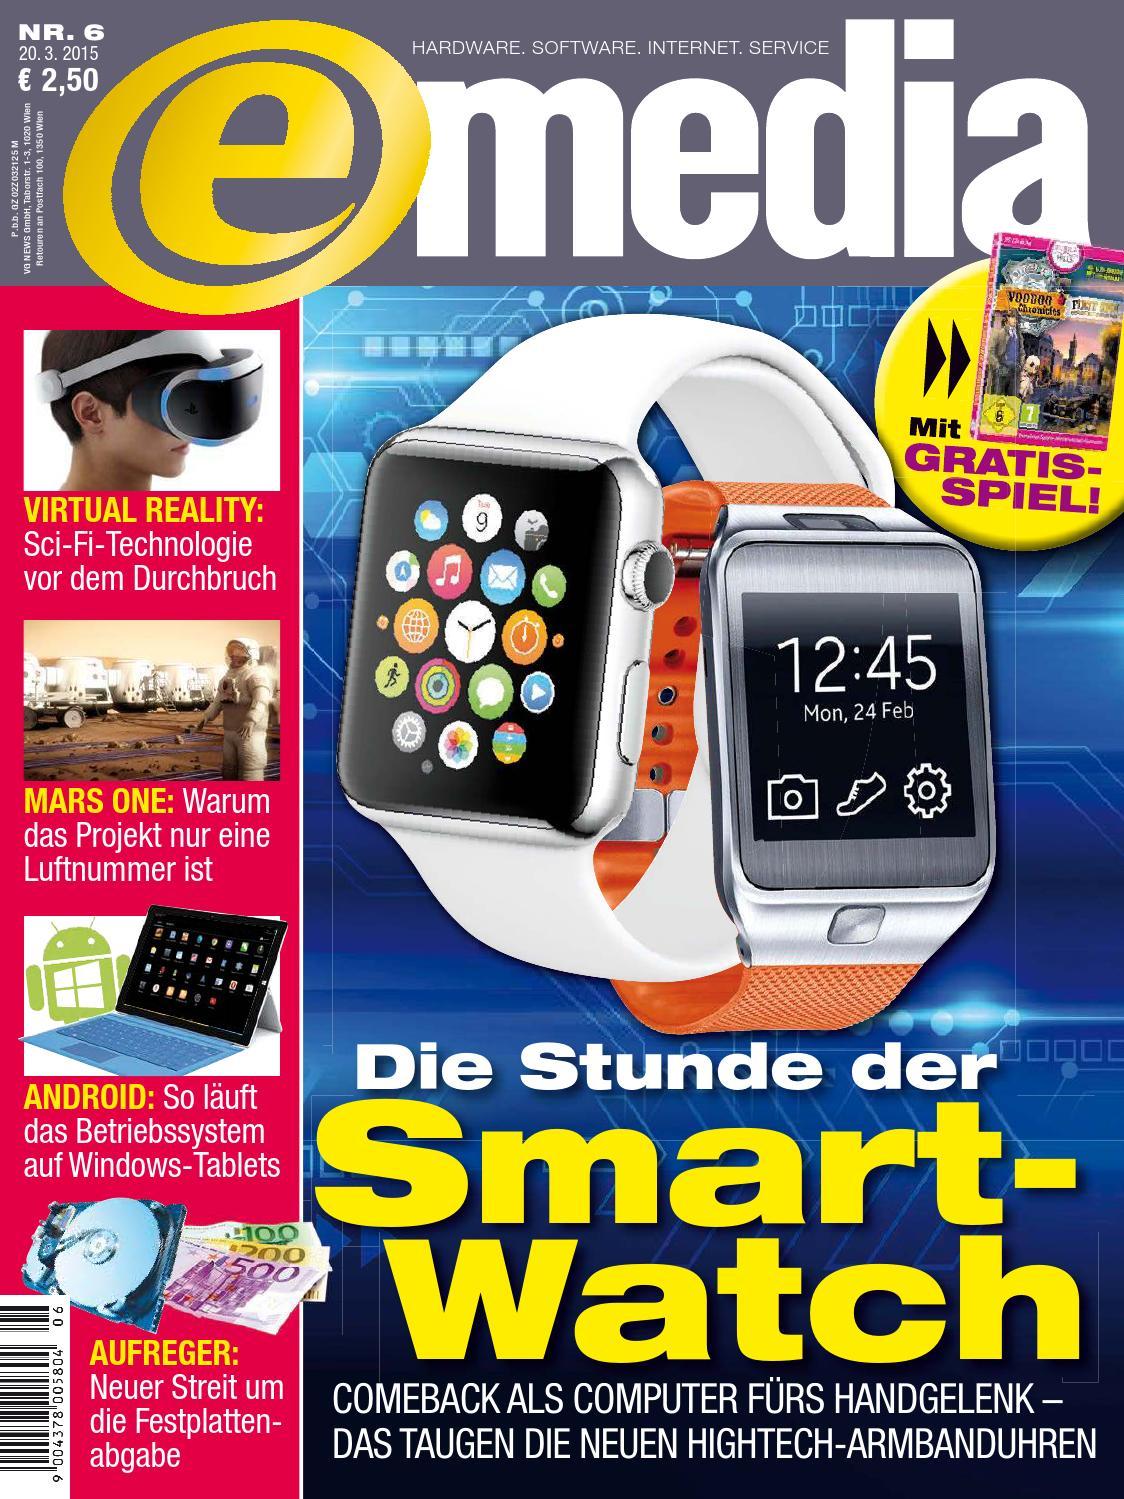 E-Media 20-03-2015 by Zockerstübchen - issuu